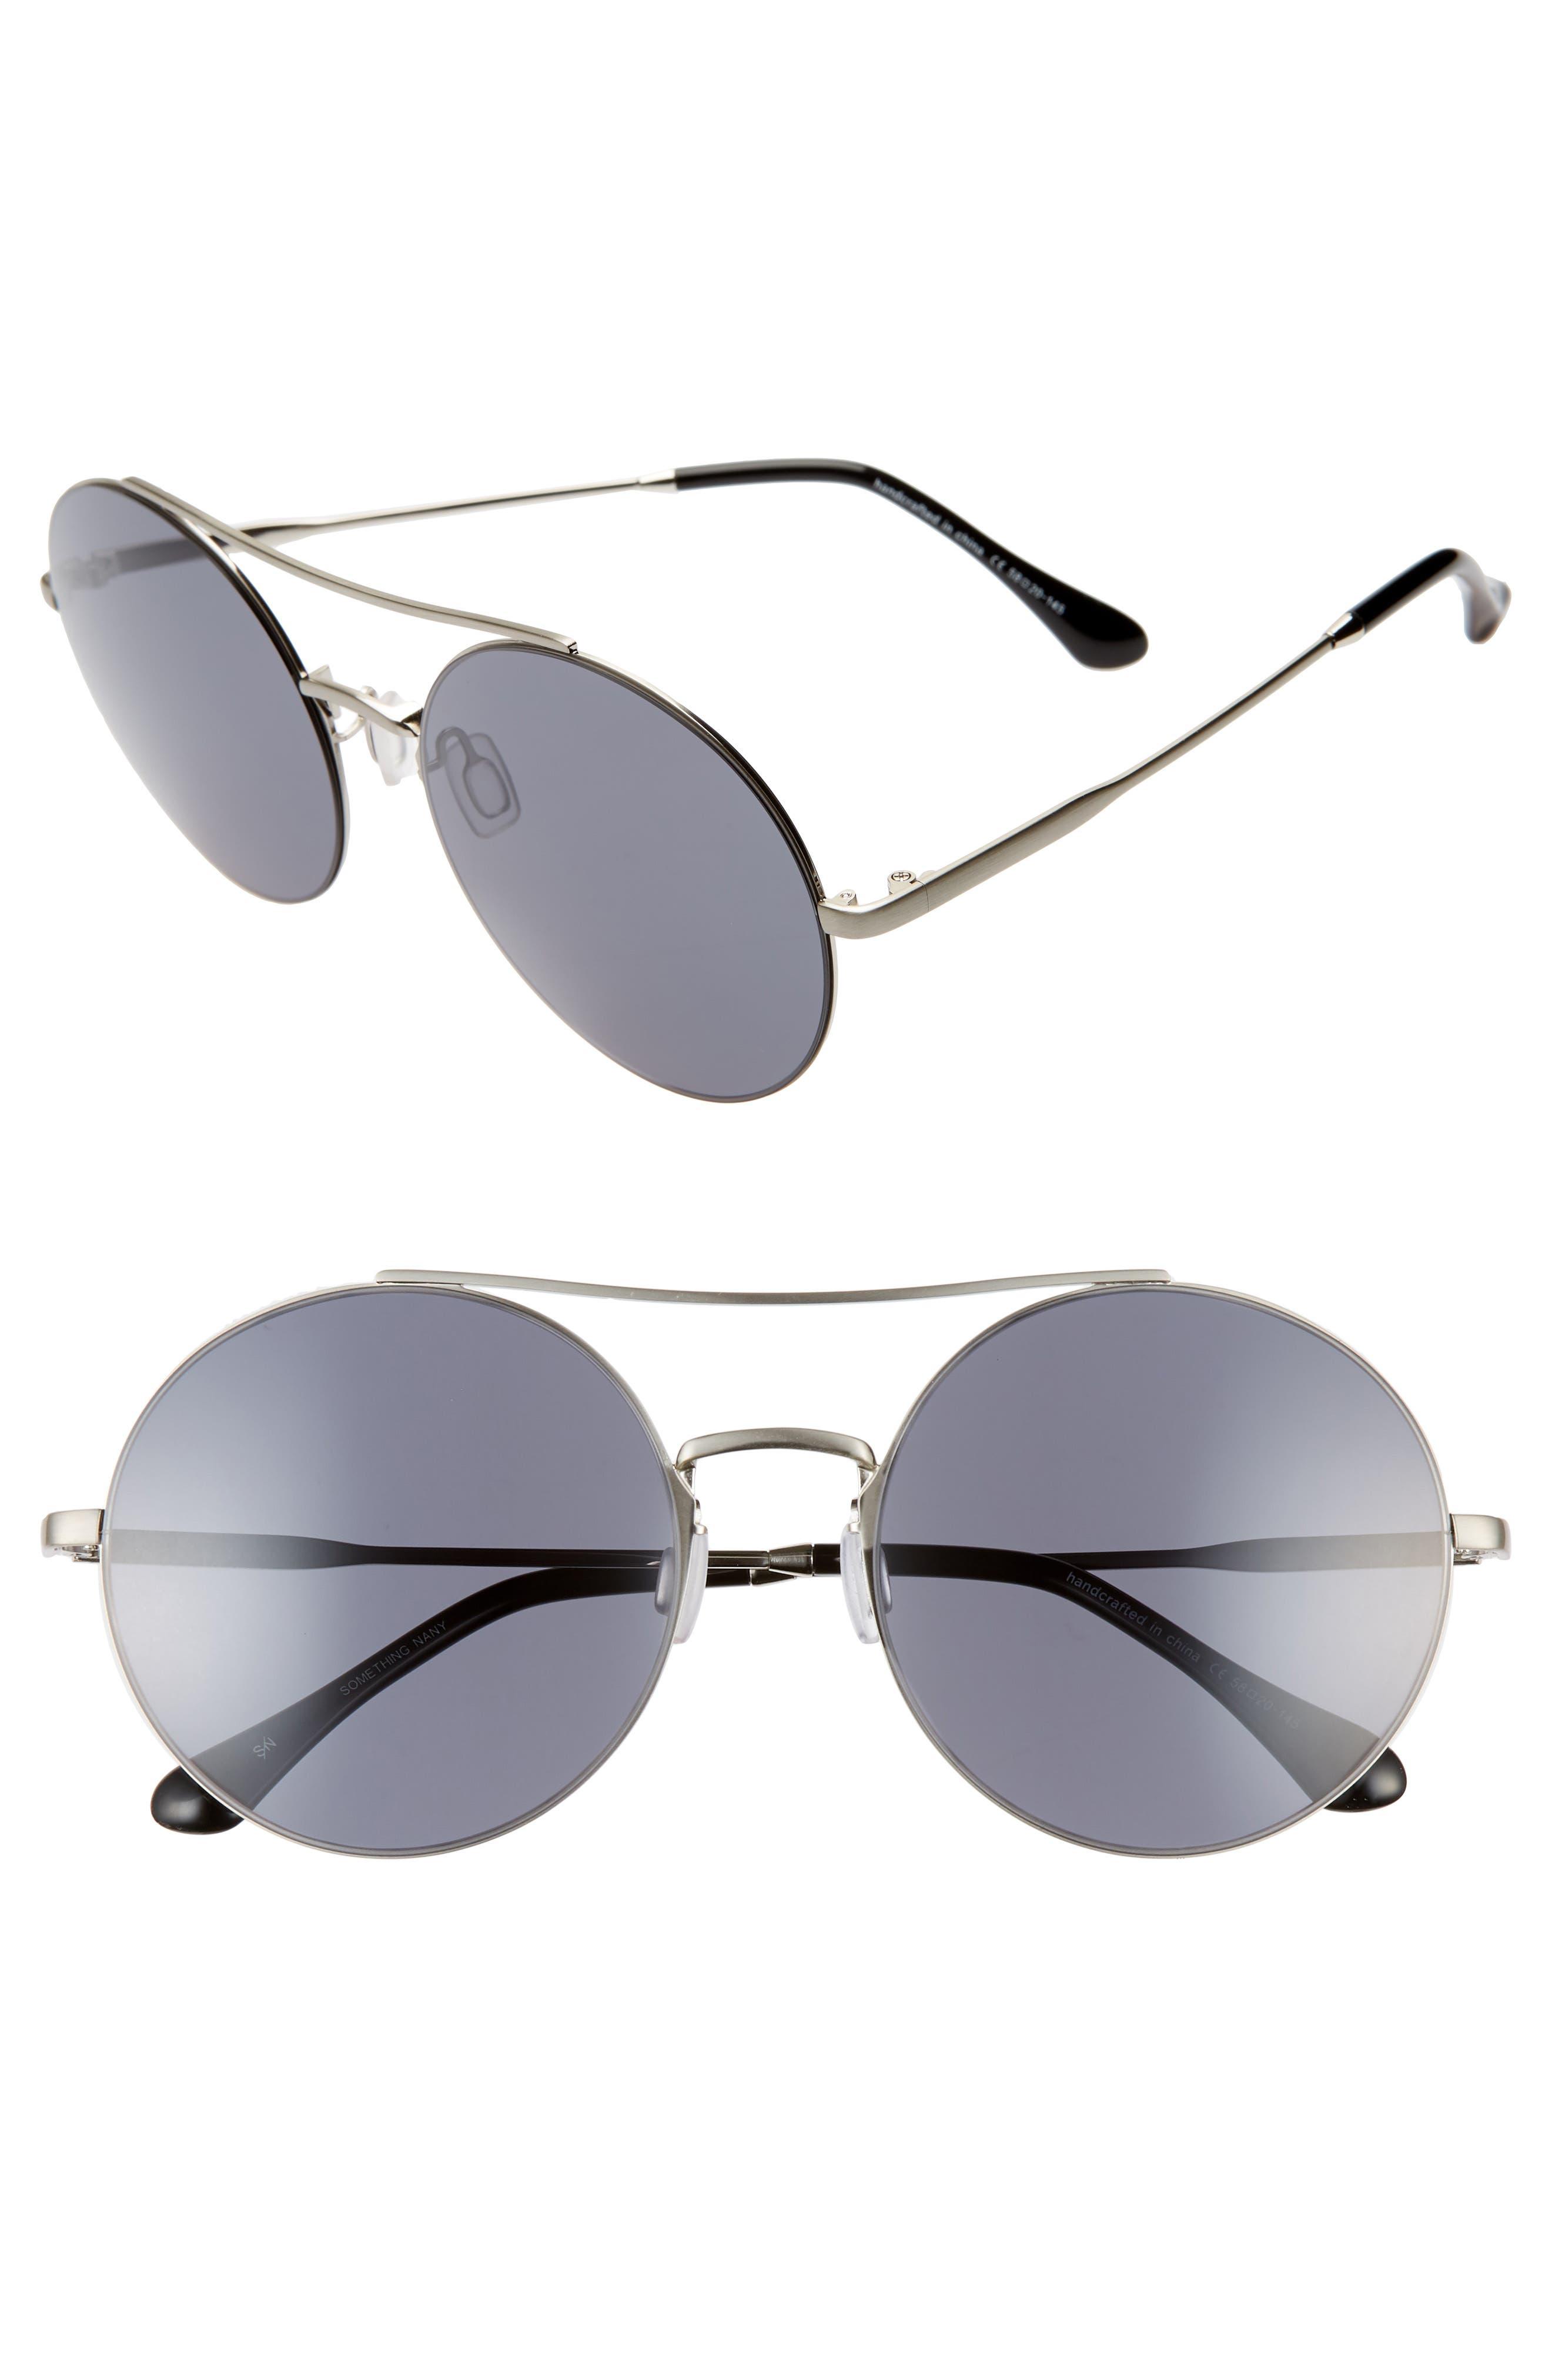 Something Navy 5m Round Aviator Sunglasses - Silver/ Dark Grey (Nordstrom Exclusive)